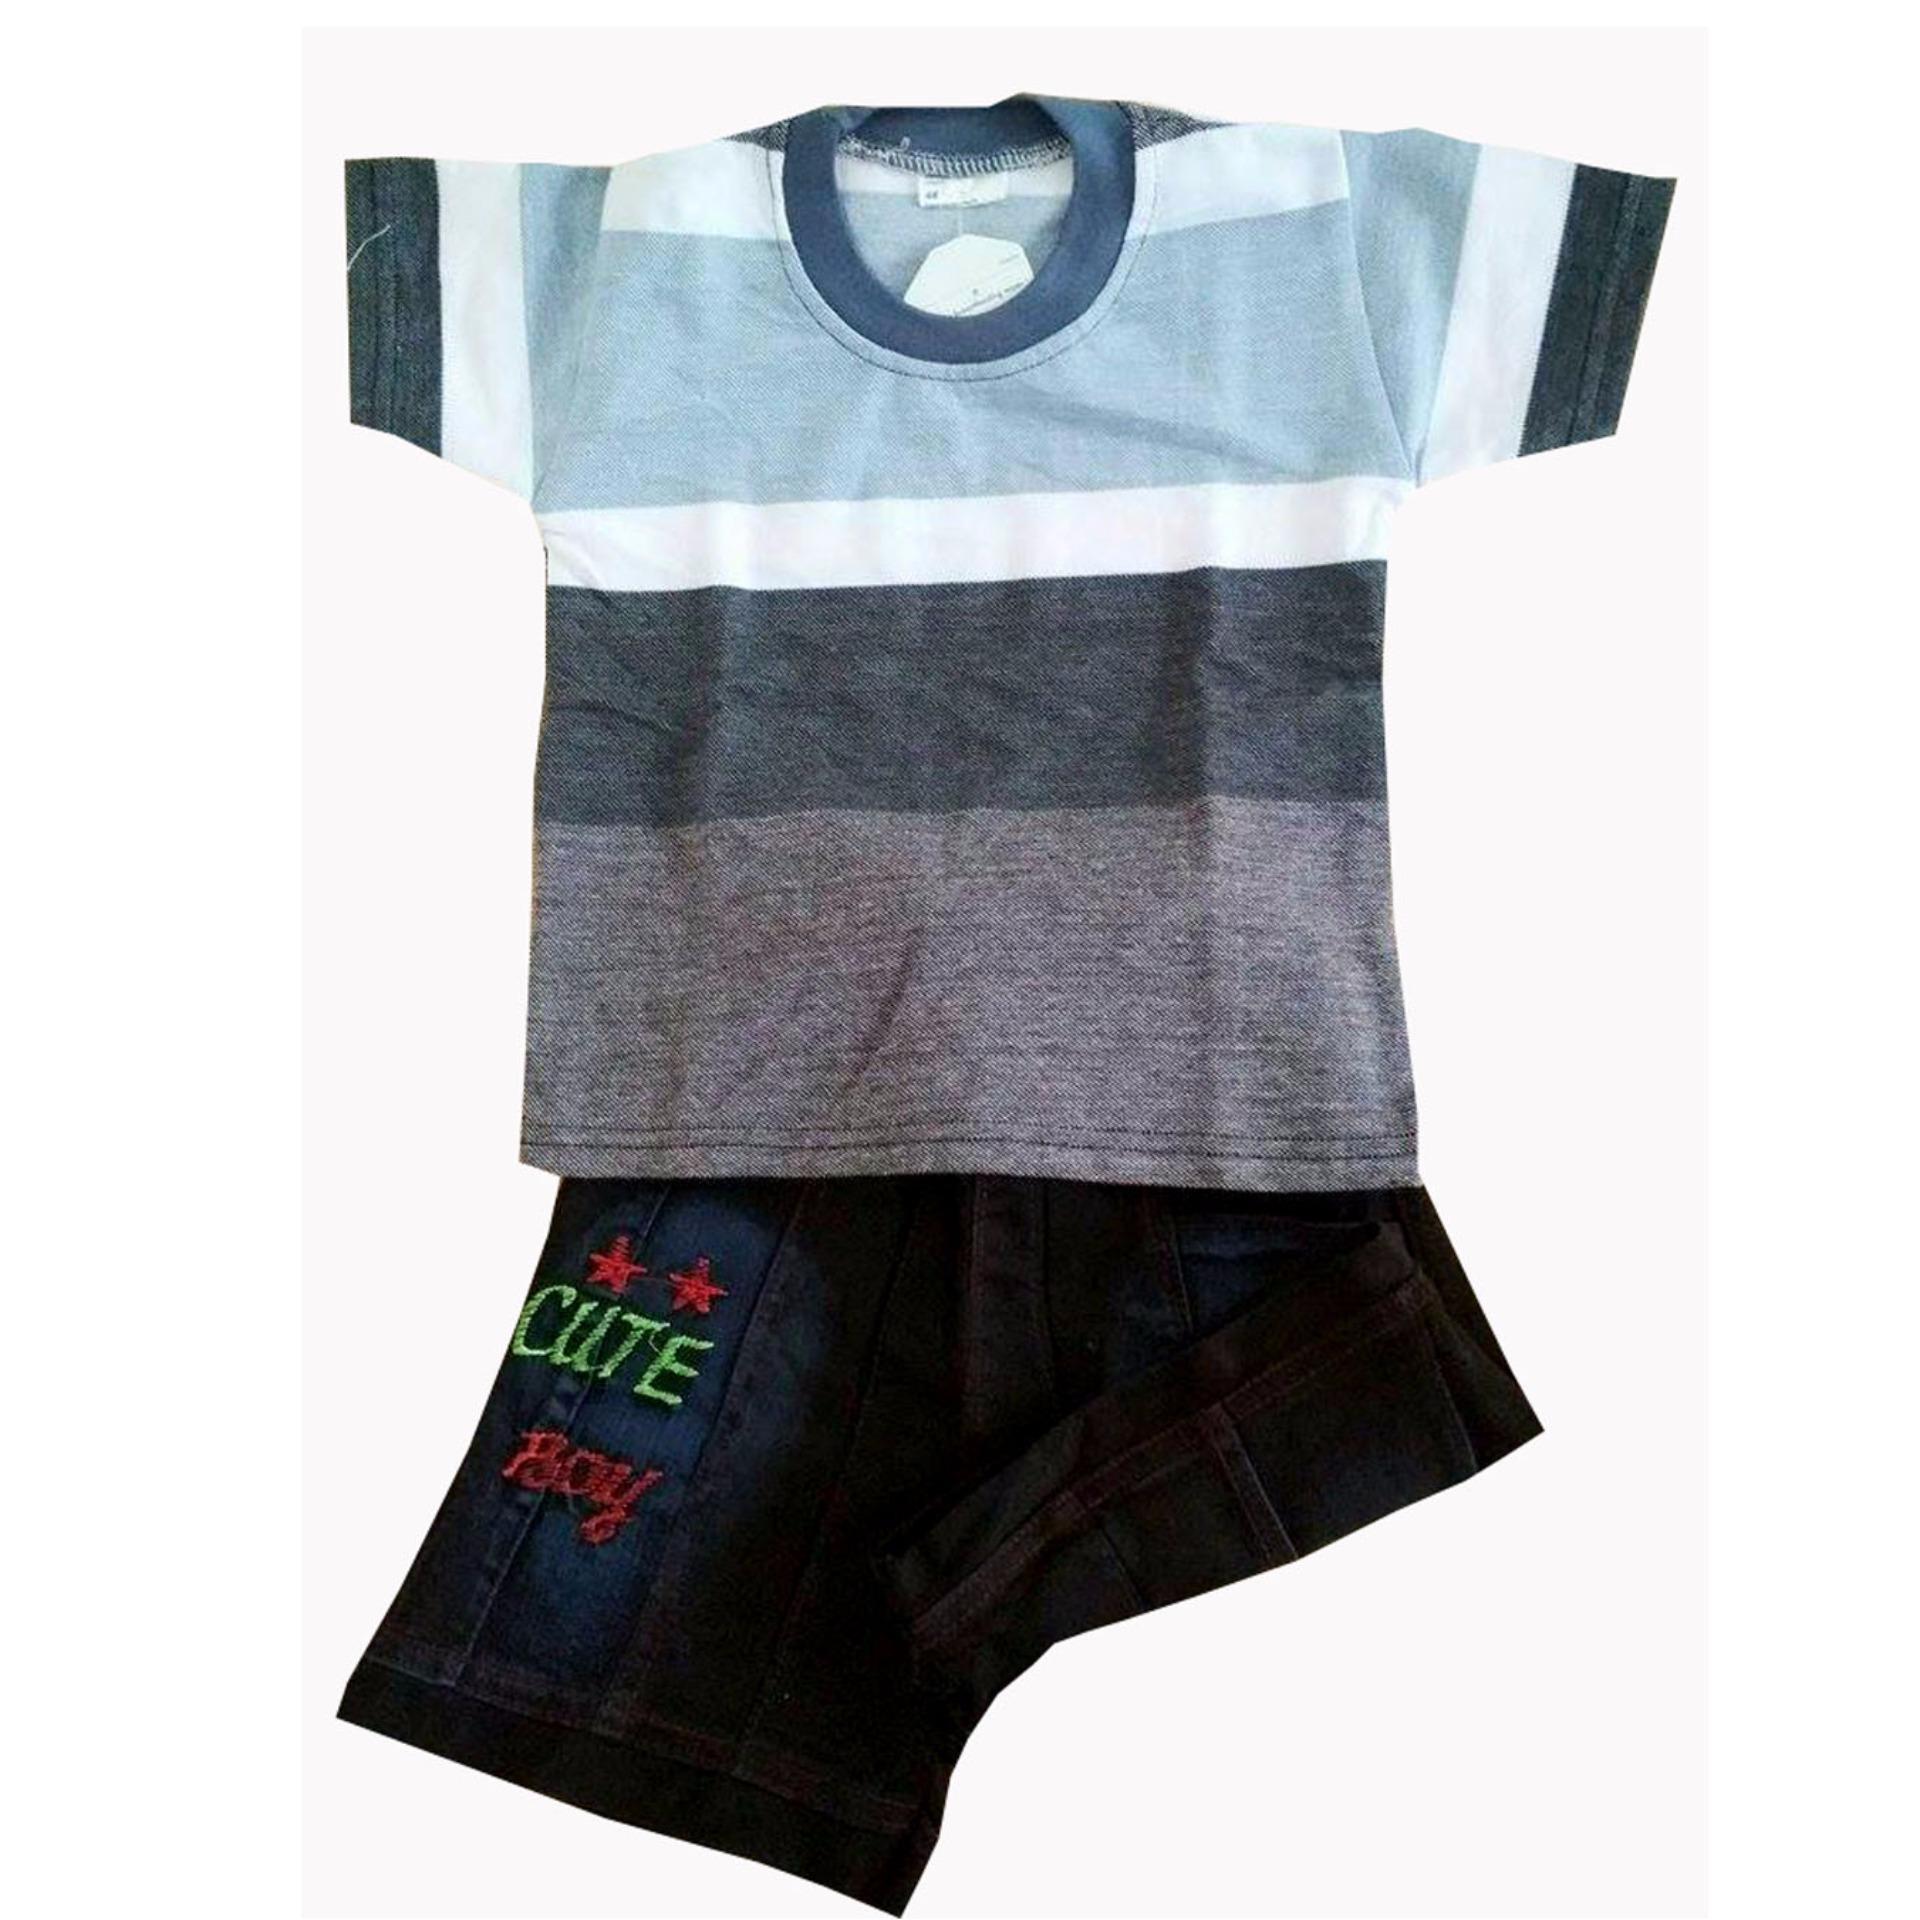 Spesifikasi Stelan Kaos Anak Boy Usia 1 Tahun Size S Terbaru